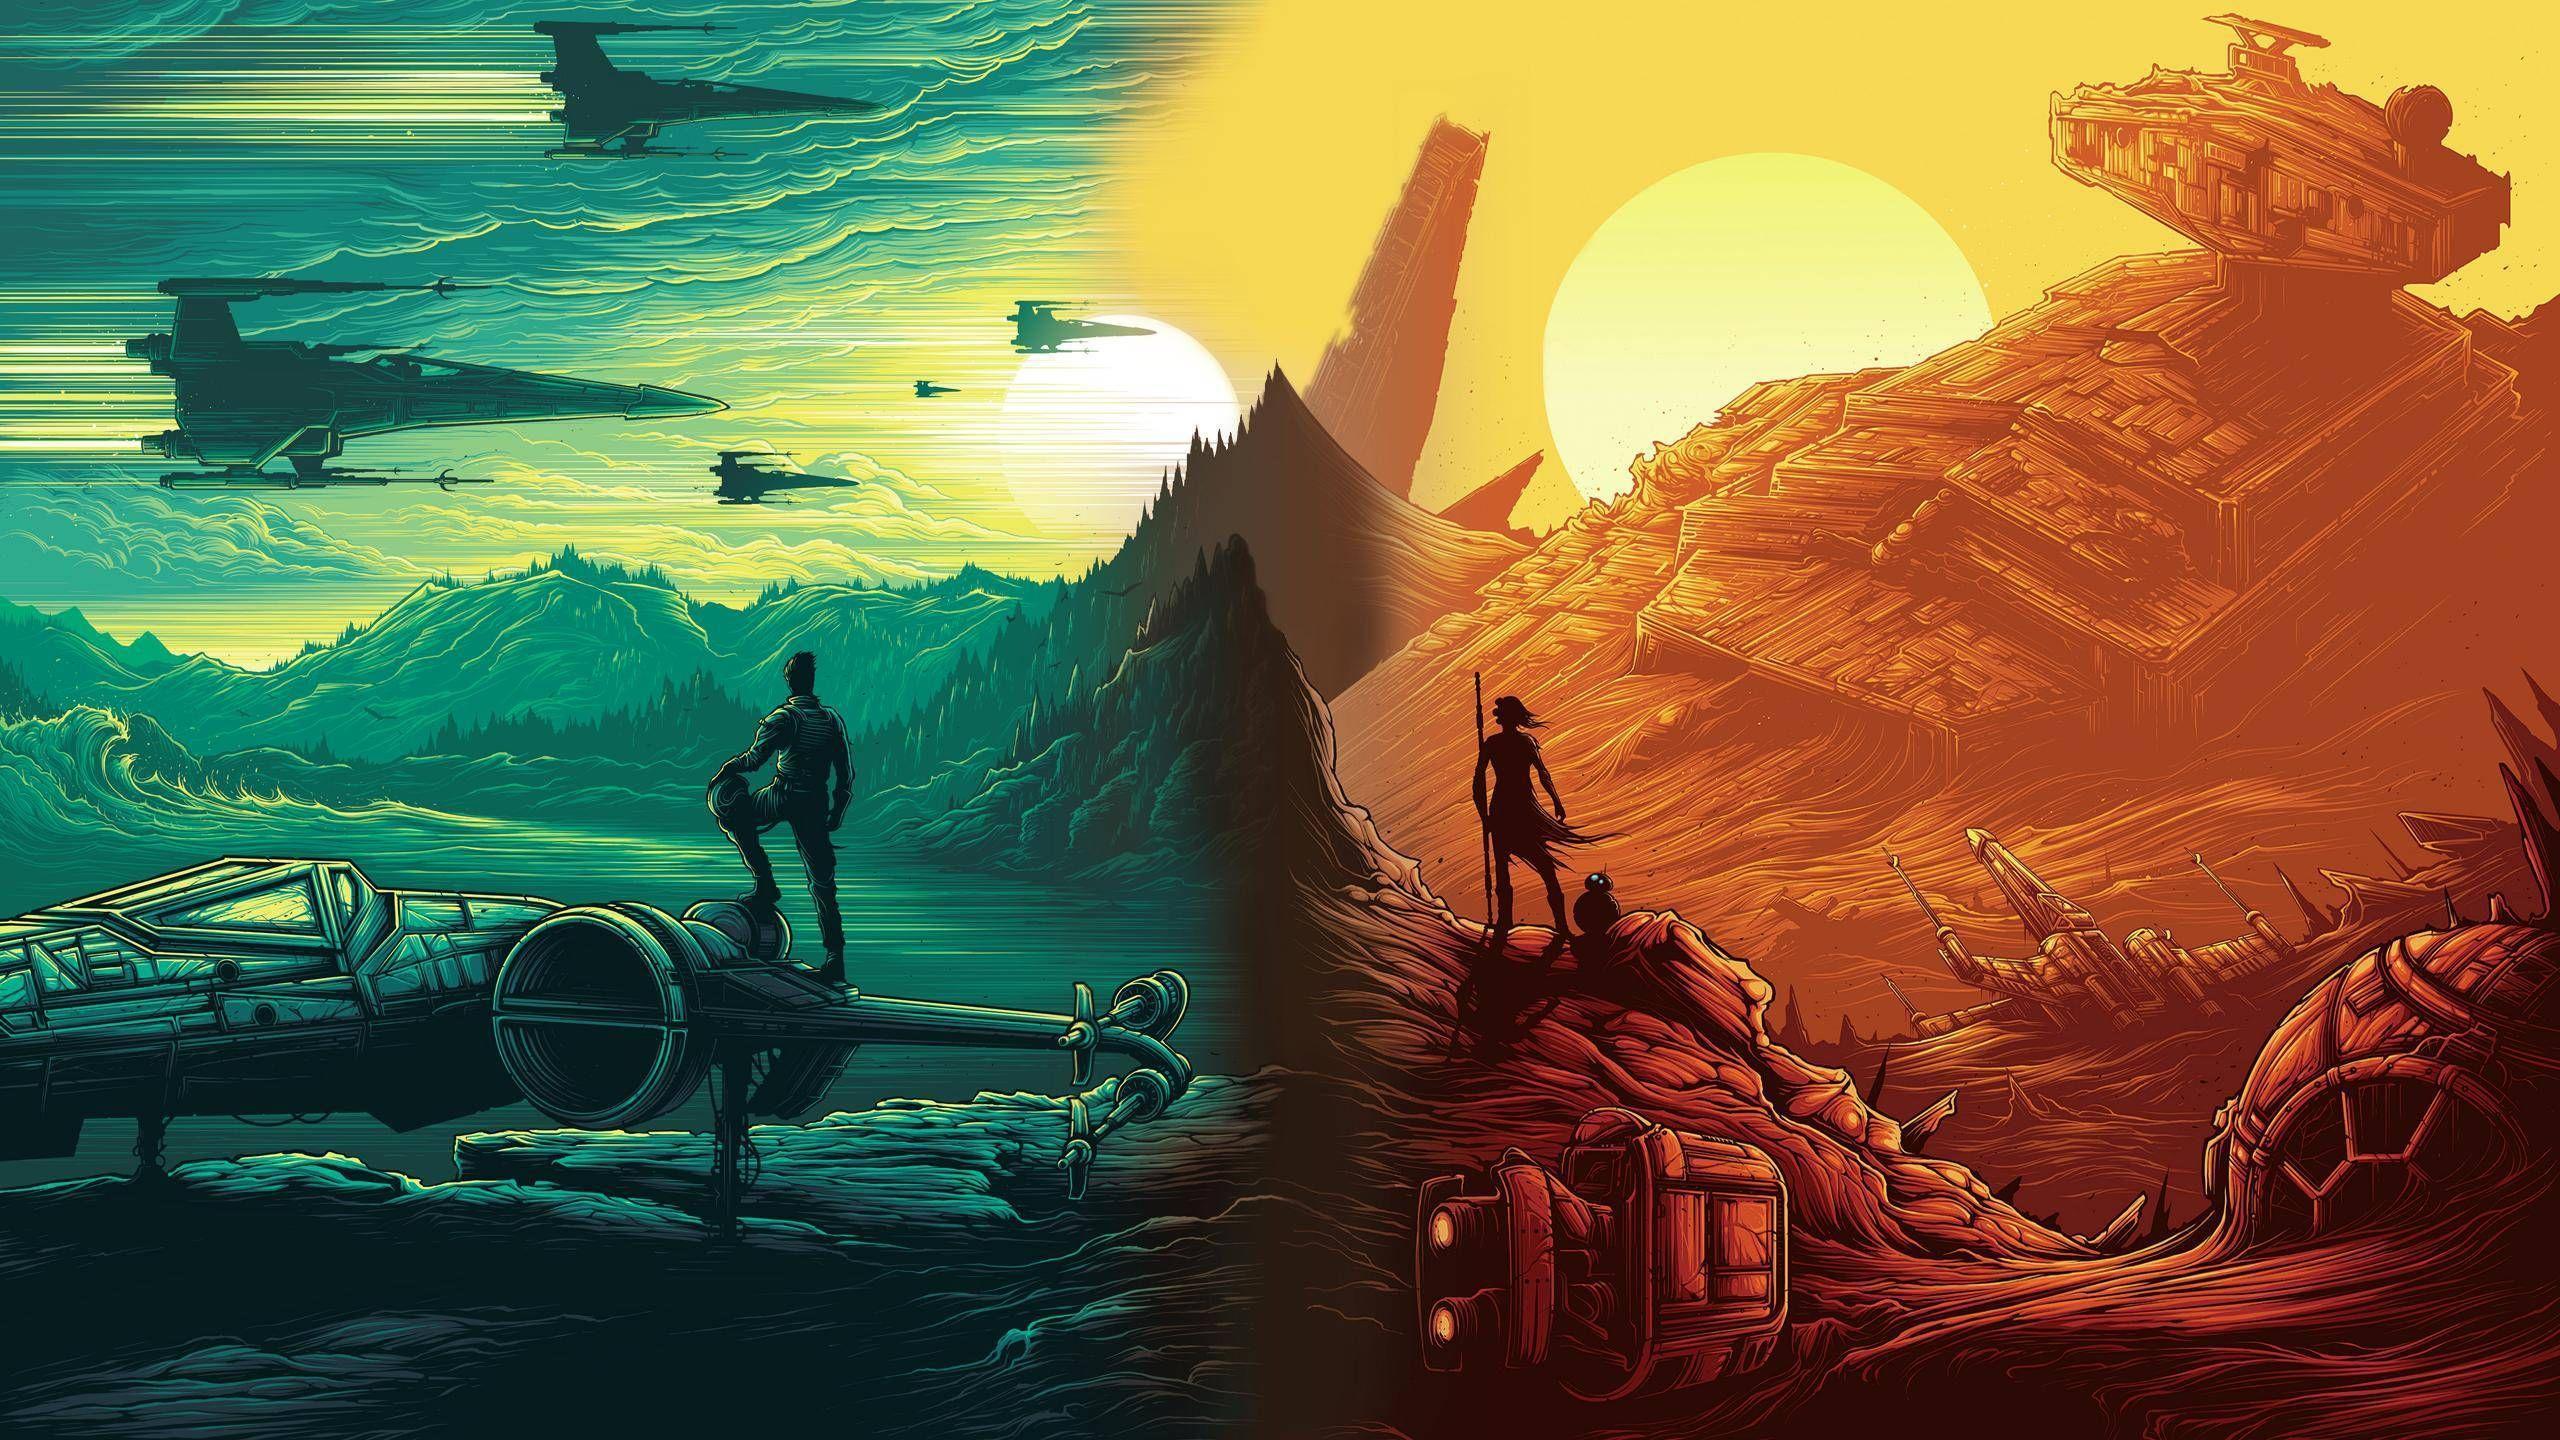 Star Wars Art Wallpapers Top Free Star Wars Art Backgrounds Wallpaperaccess